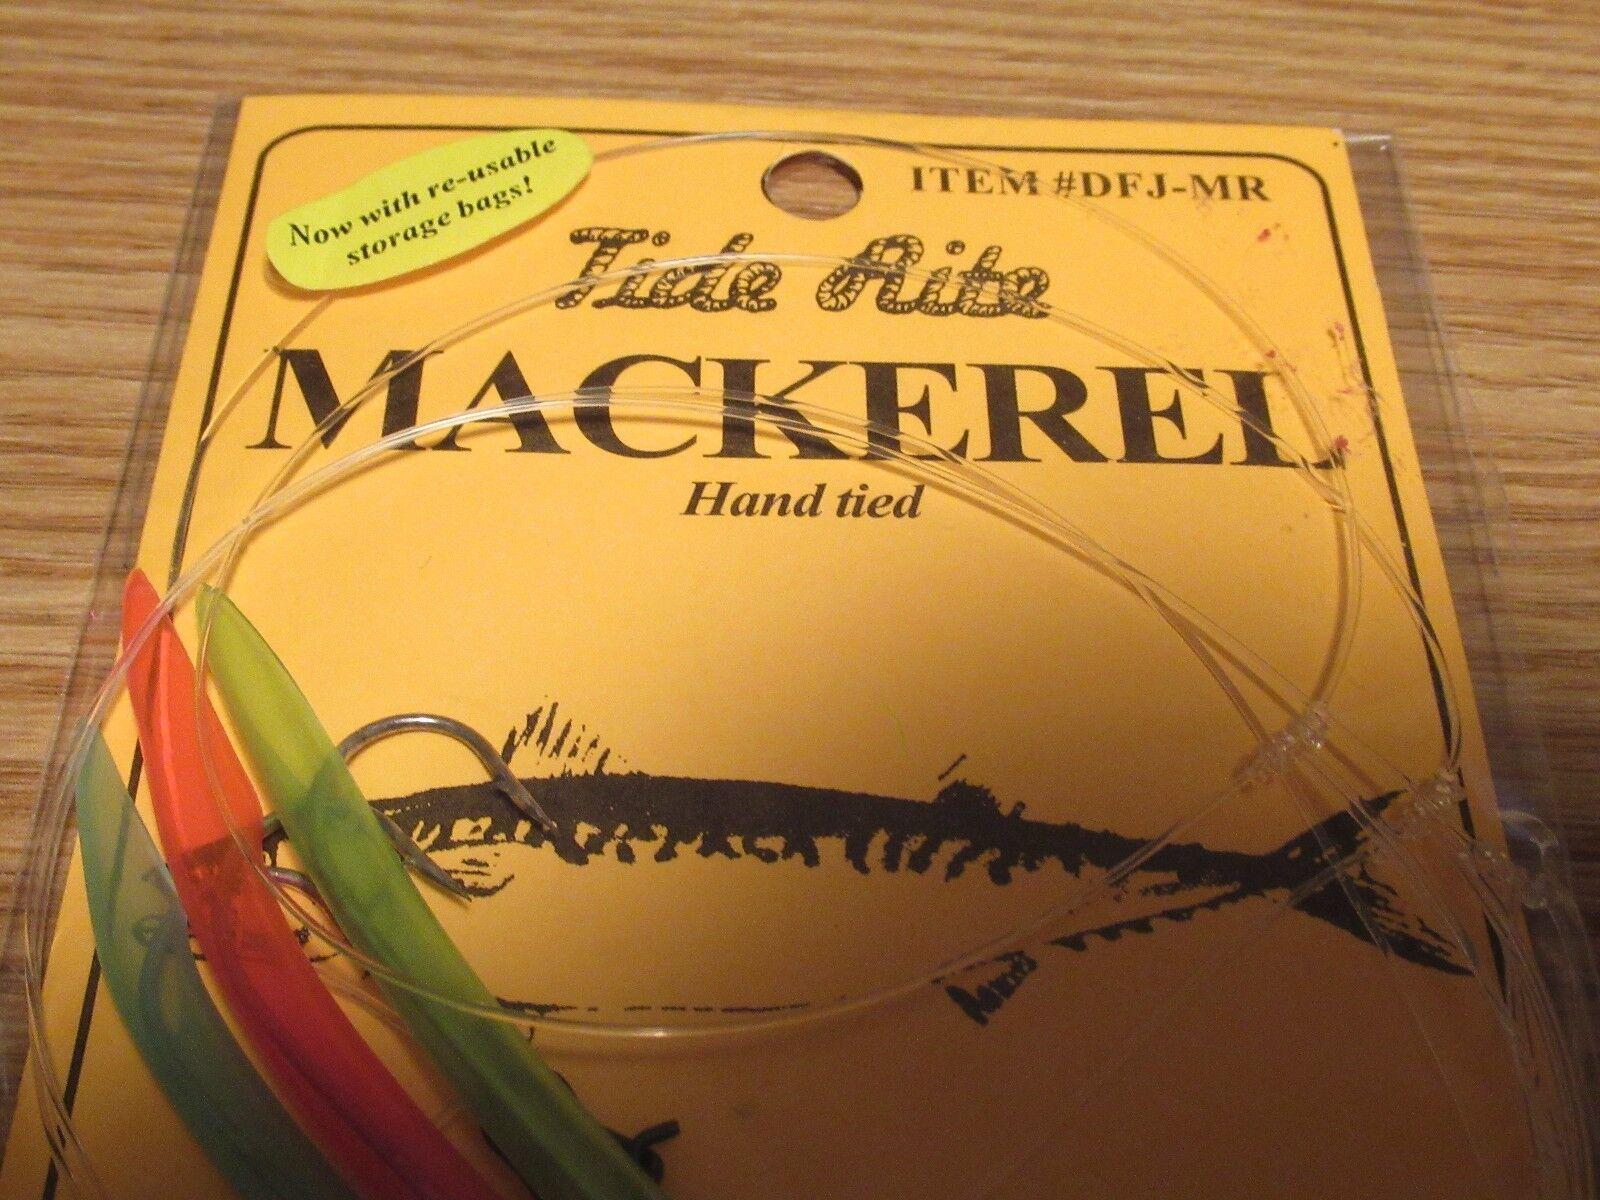 12 TIDE RITE MACKEREL 3 DROP TREE TUBE DFJ-MR BAIT FISH MACKERAL  FISHING RIGS